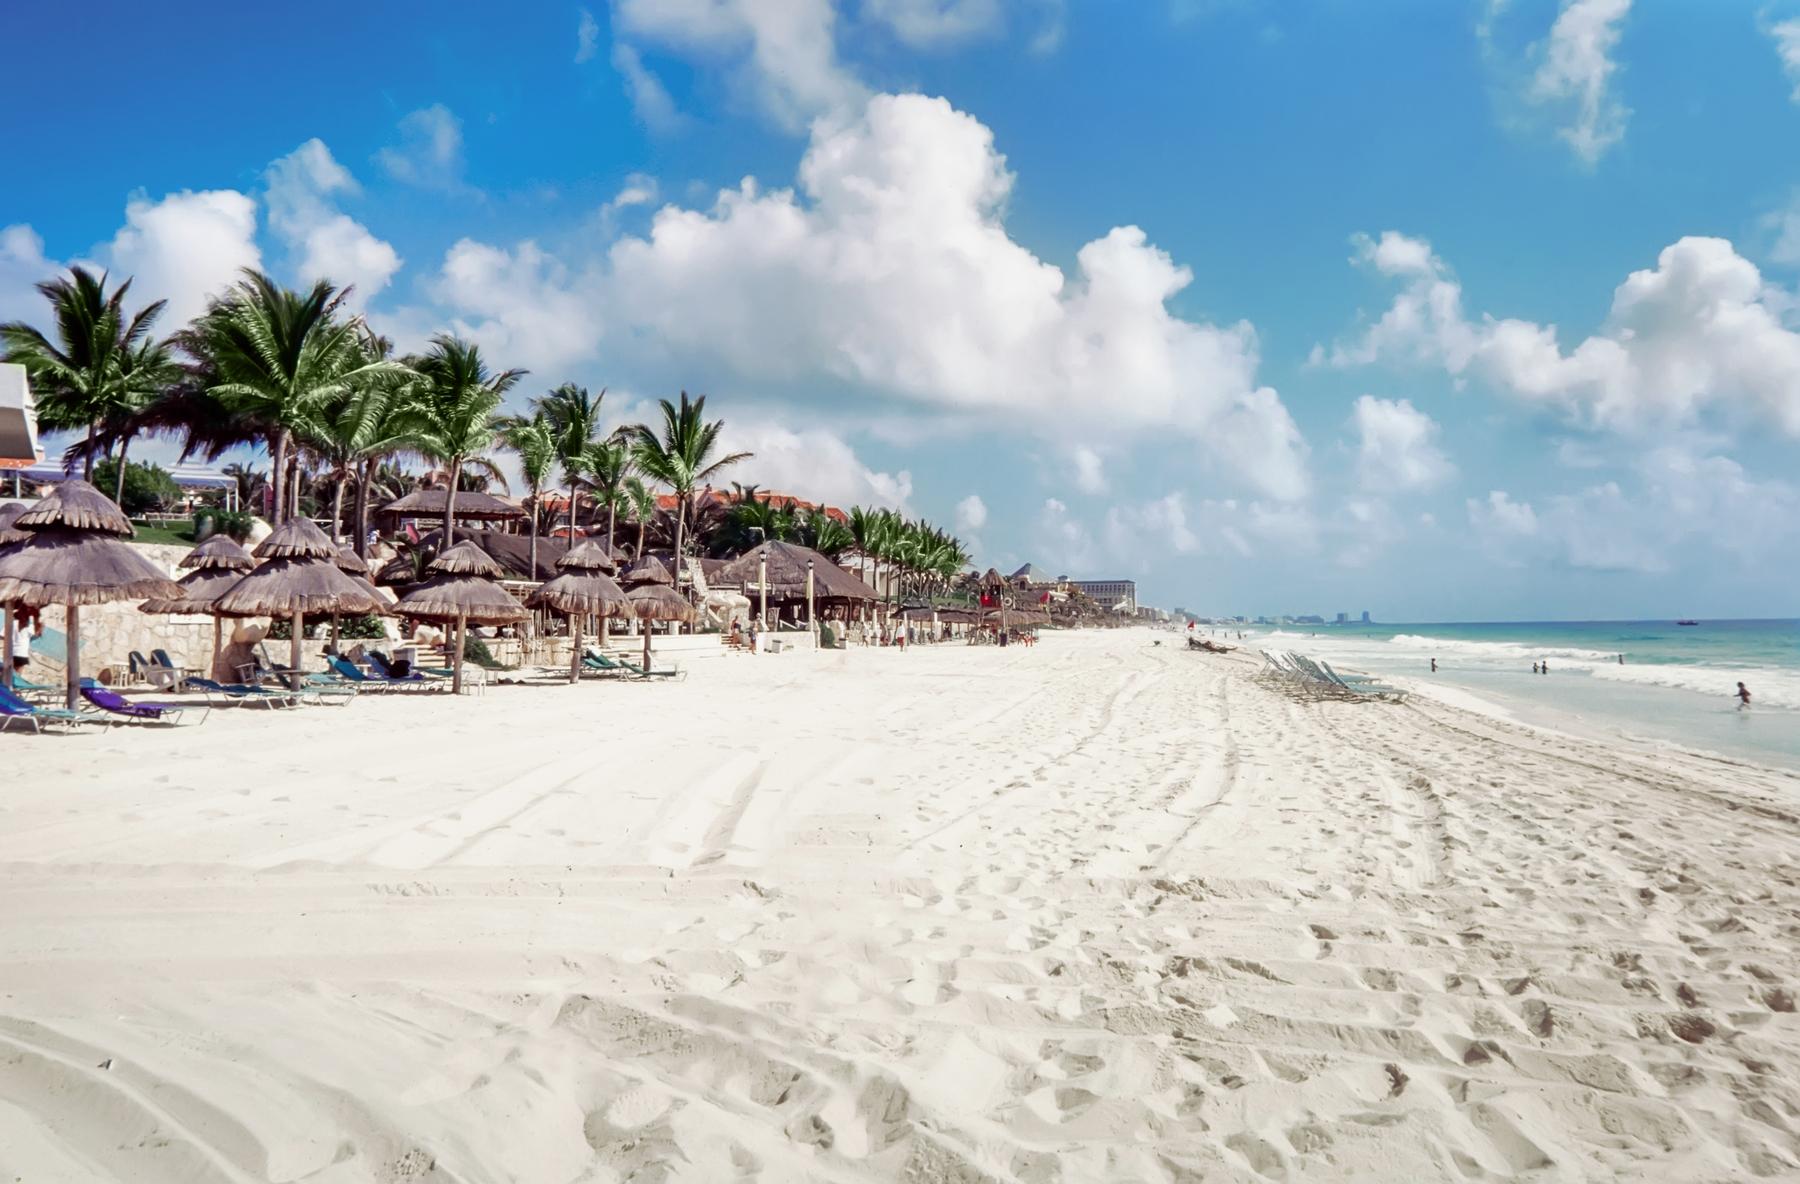 Enjoy sandy beaches near Cancun, Mexico--a lovely destination if you're still deciding where to go for Memorial Day weekend.